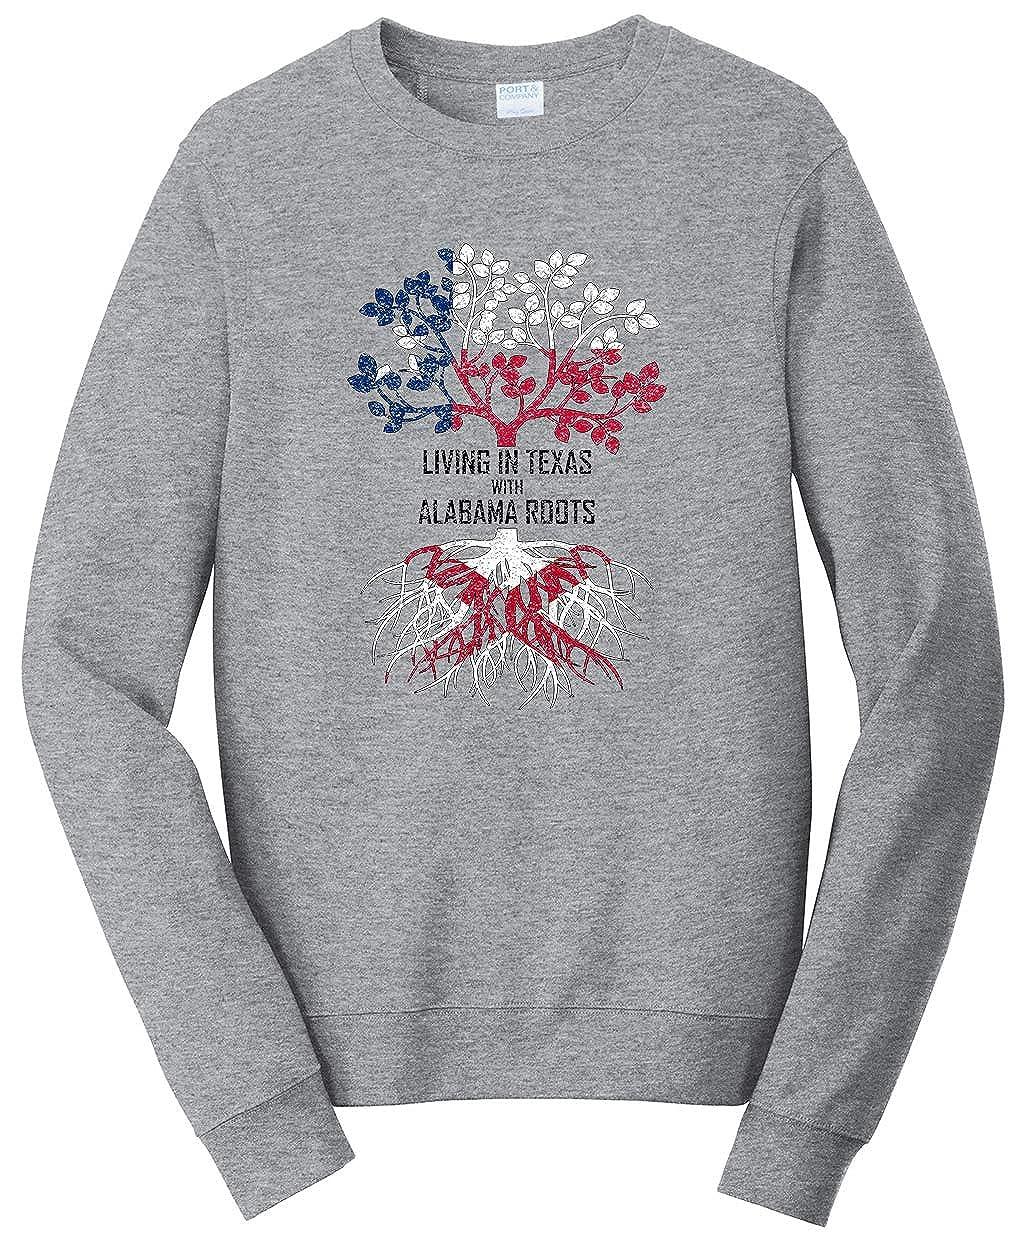 Tenacitee Girls Living in New York with Texas Roots Hooded Sweatshirt